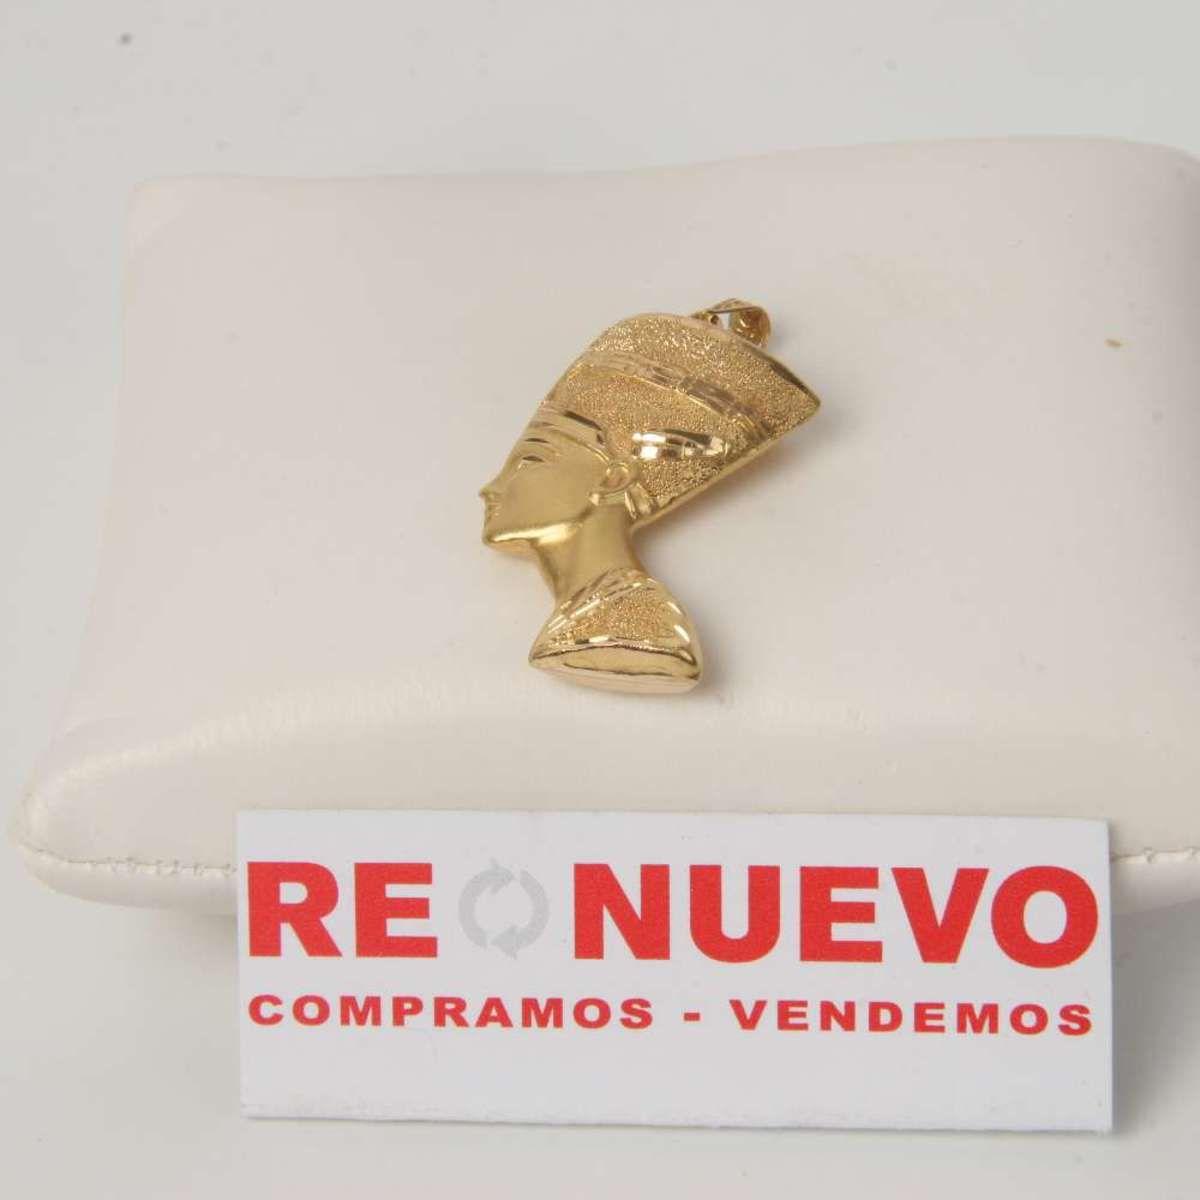 6783d17dcbea Colgante esfinge de oro de segunda mano E275047A